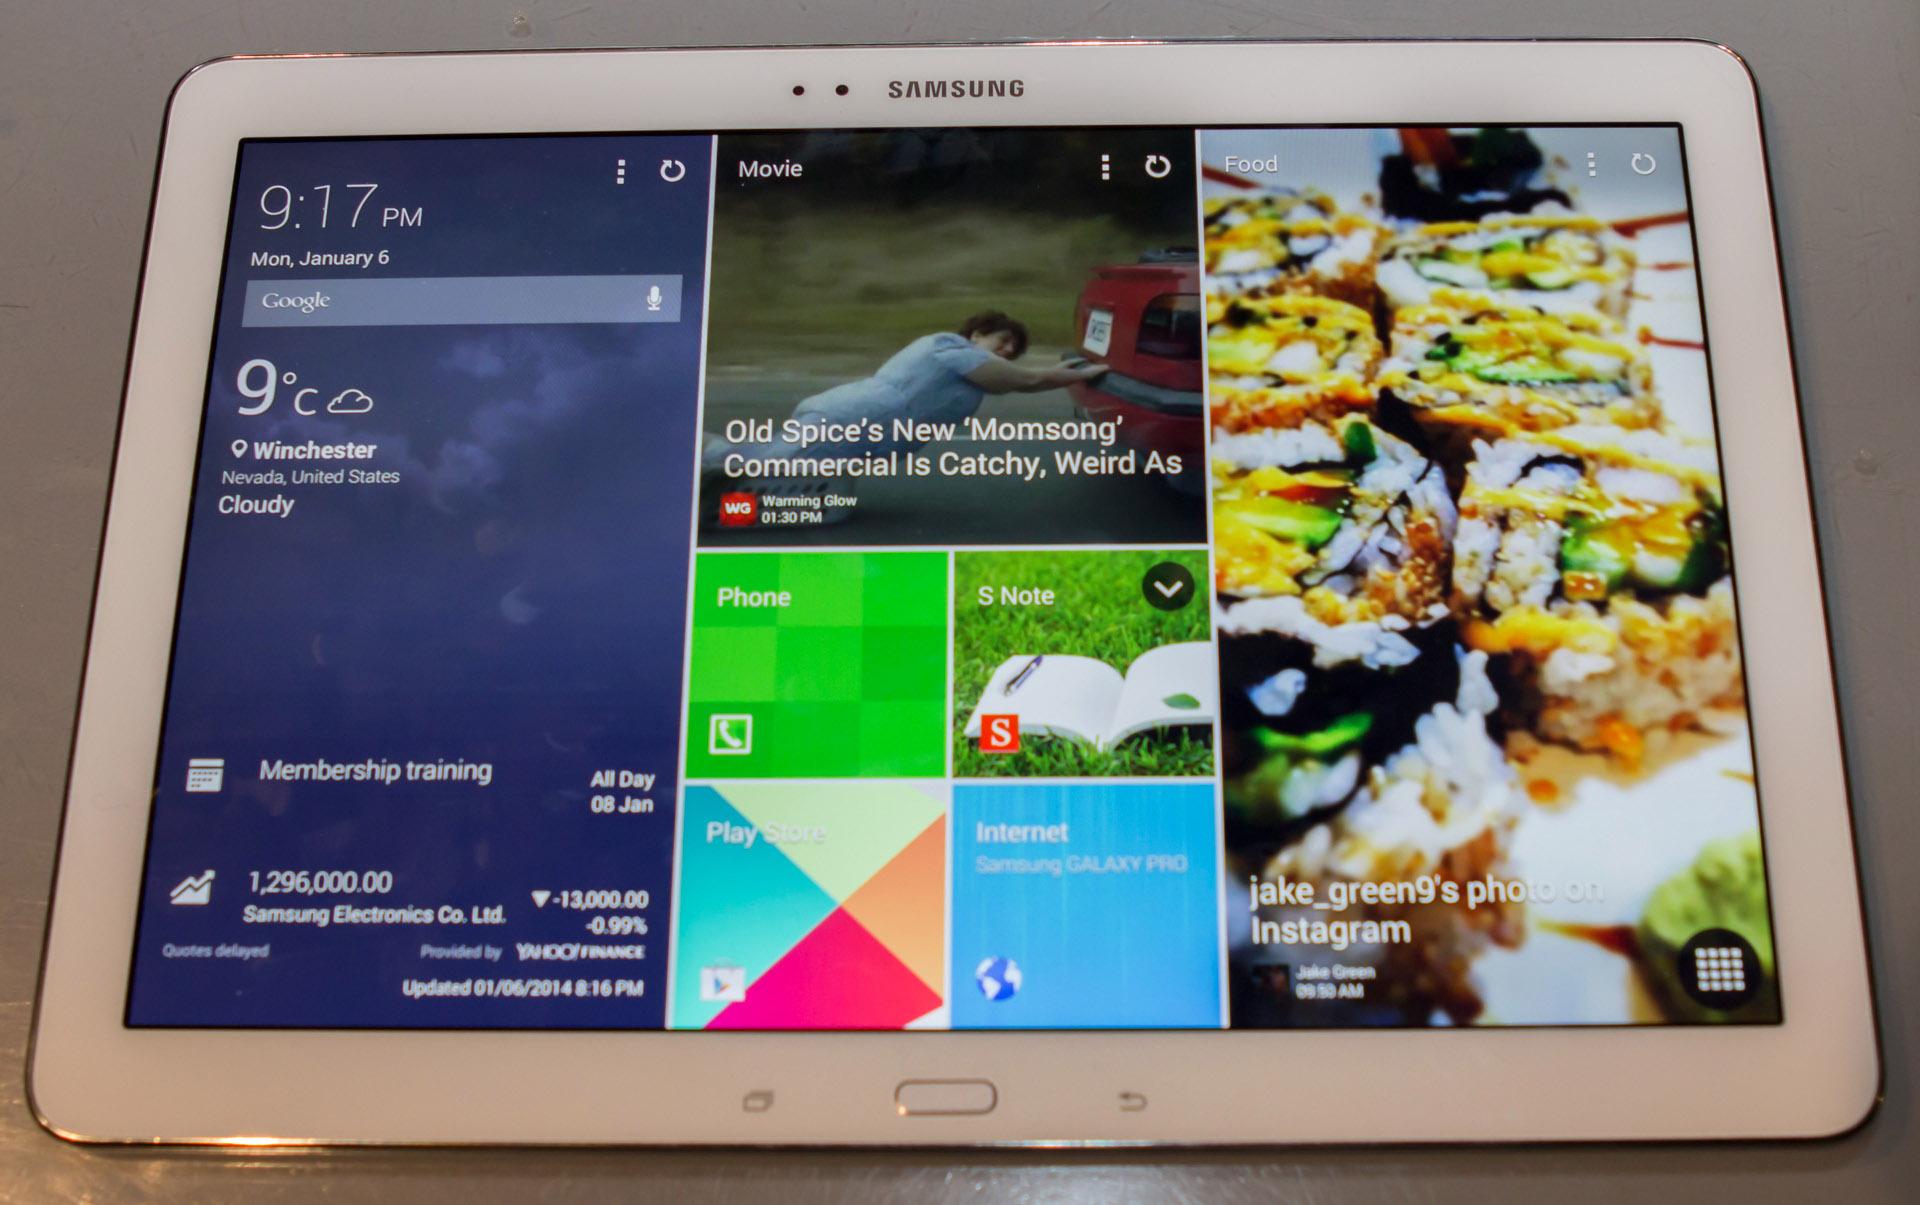 Samsung Magazine UI